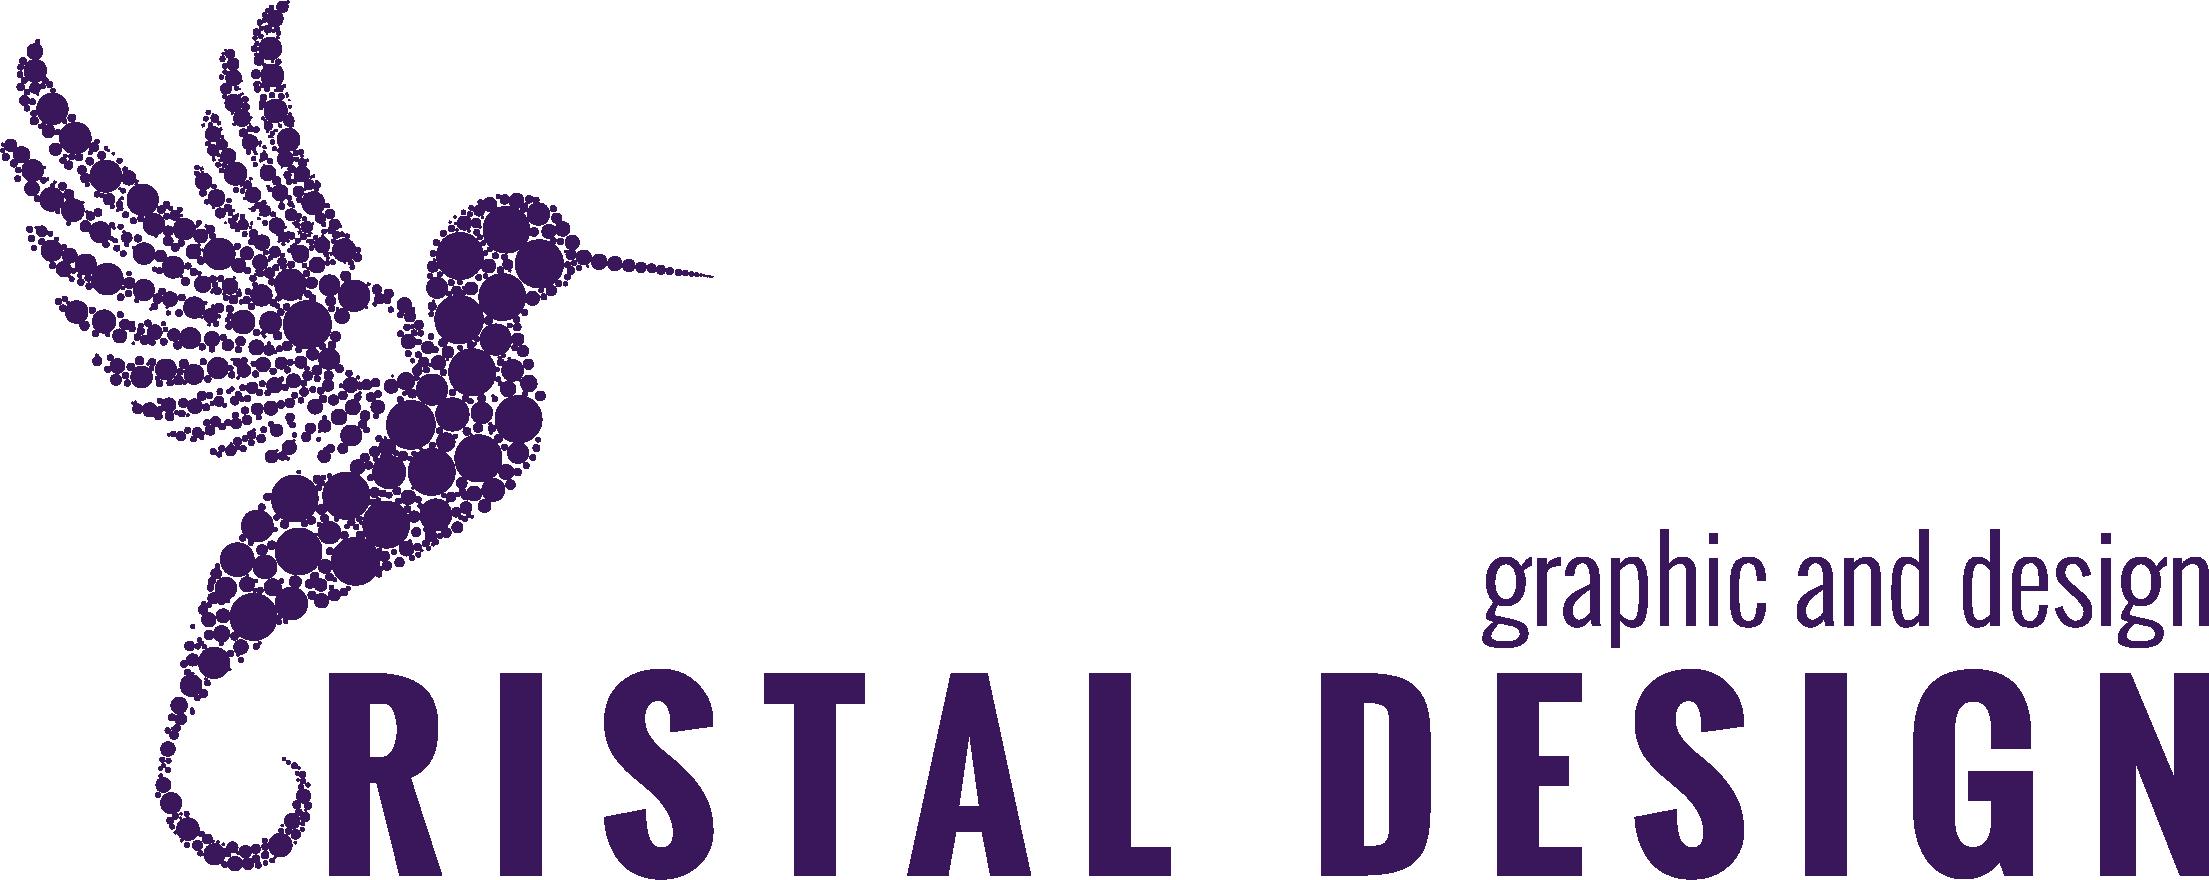 Cristal-design weboldala